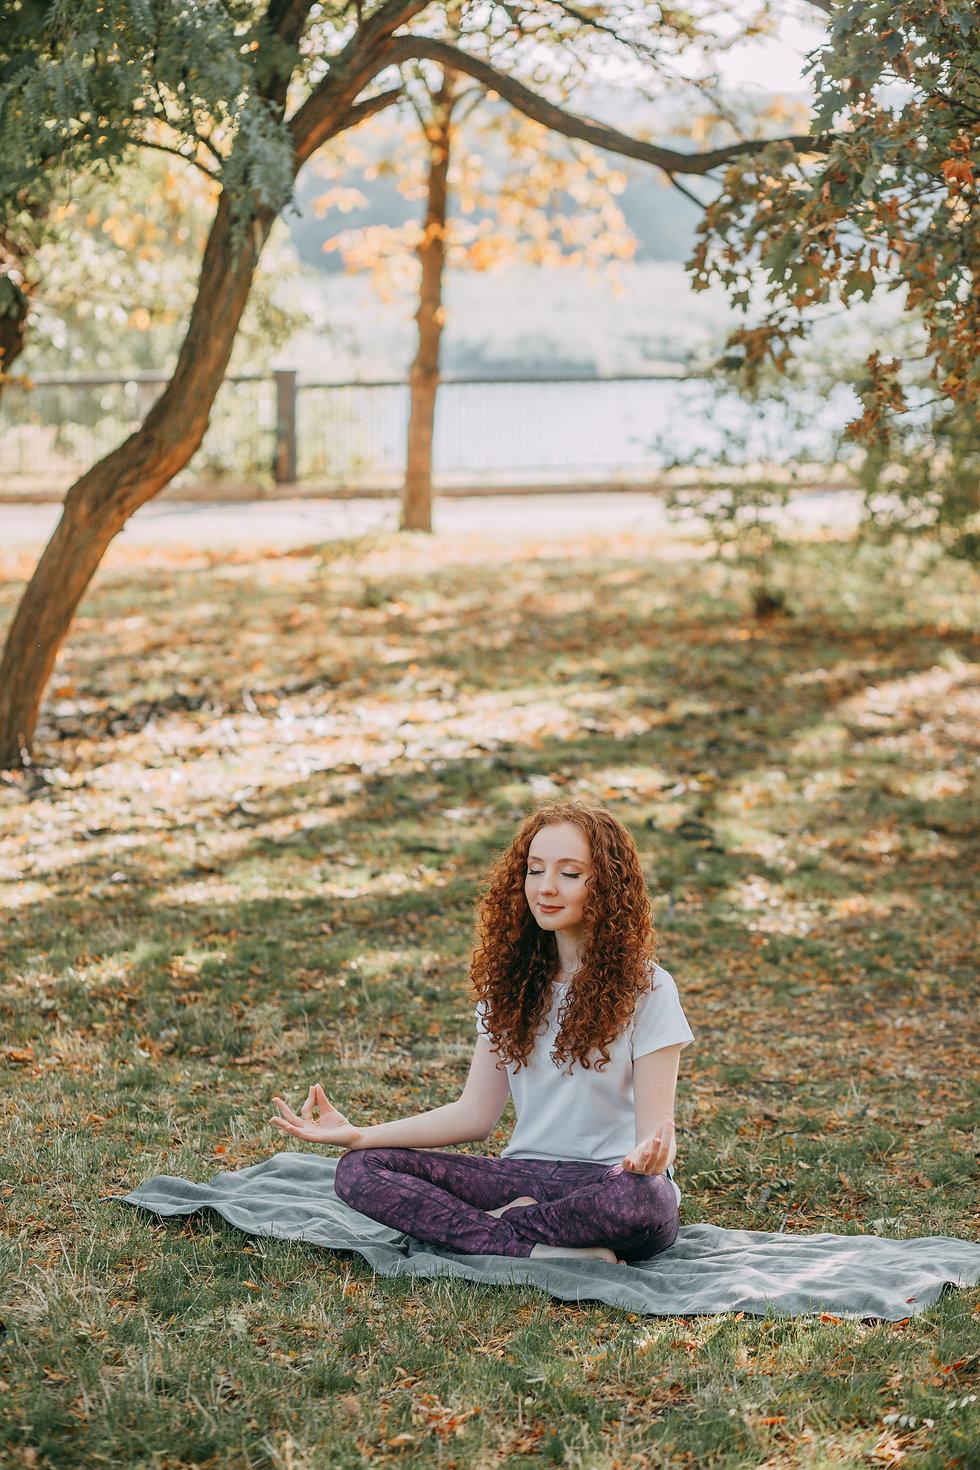 photo-of-woman-meditating-3759658.jpg